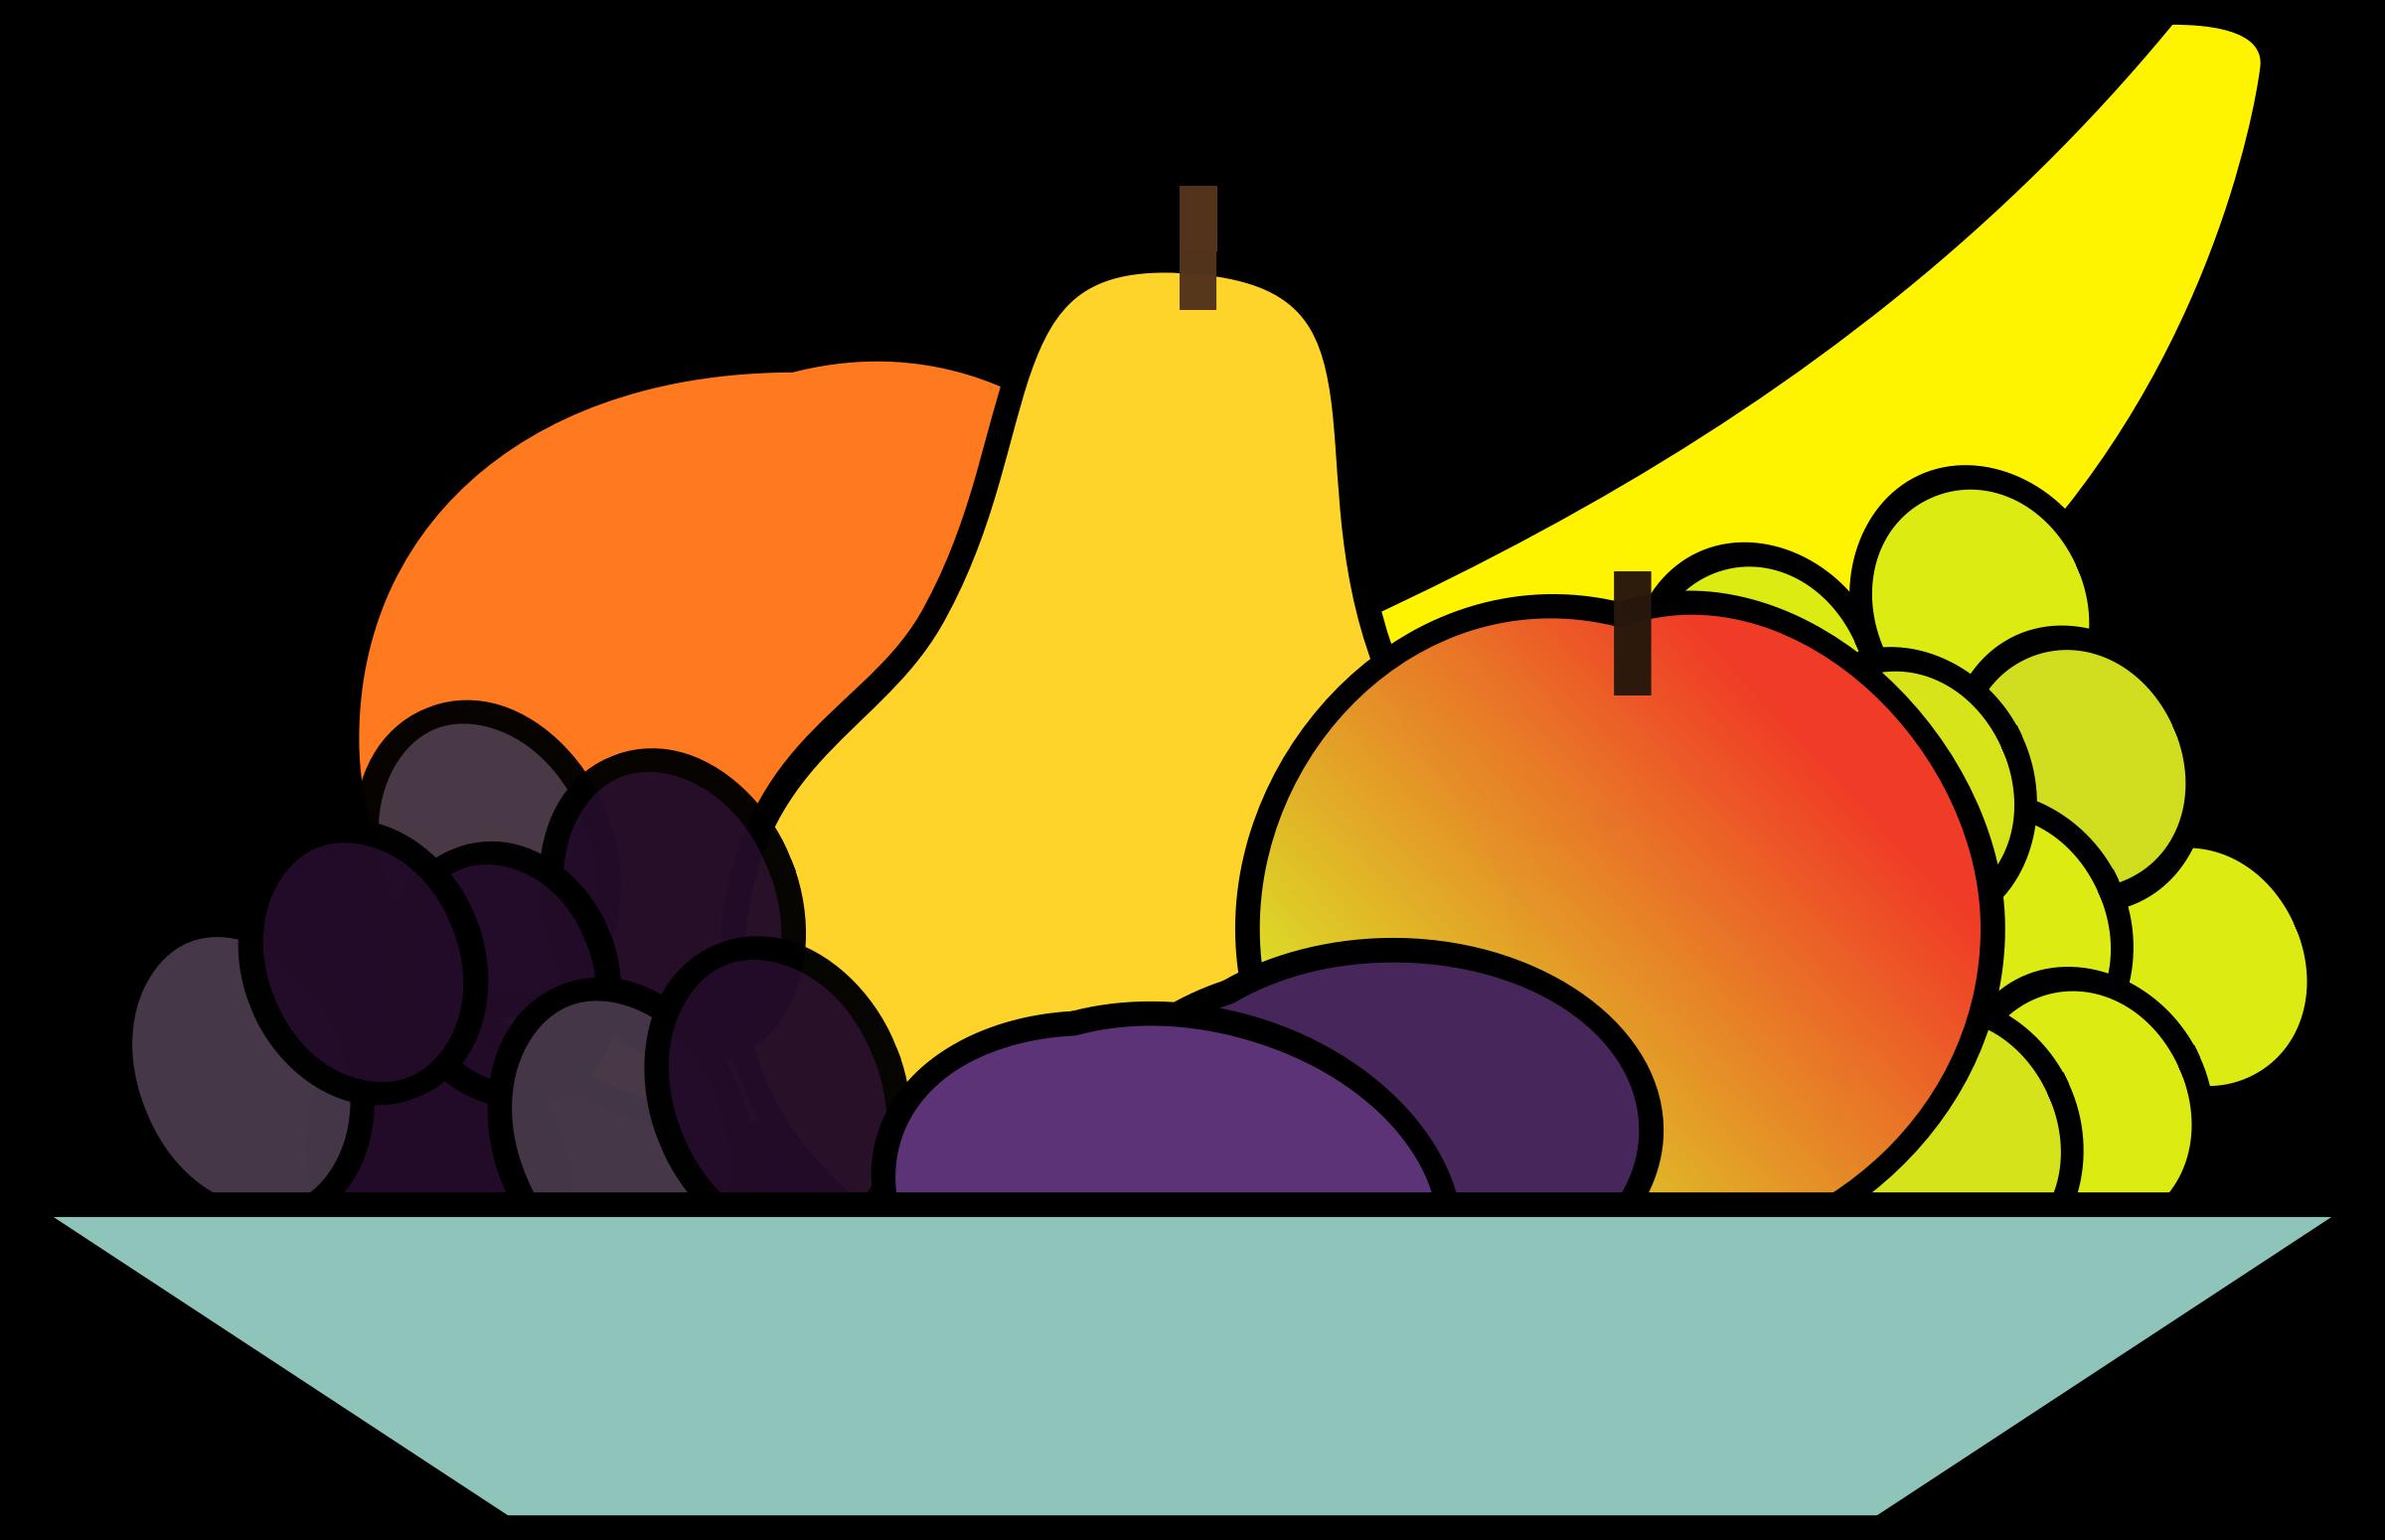 Fruit Tray Clipart.